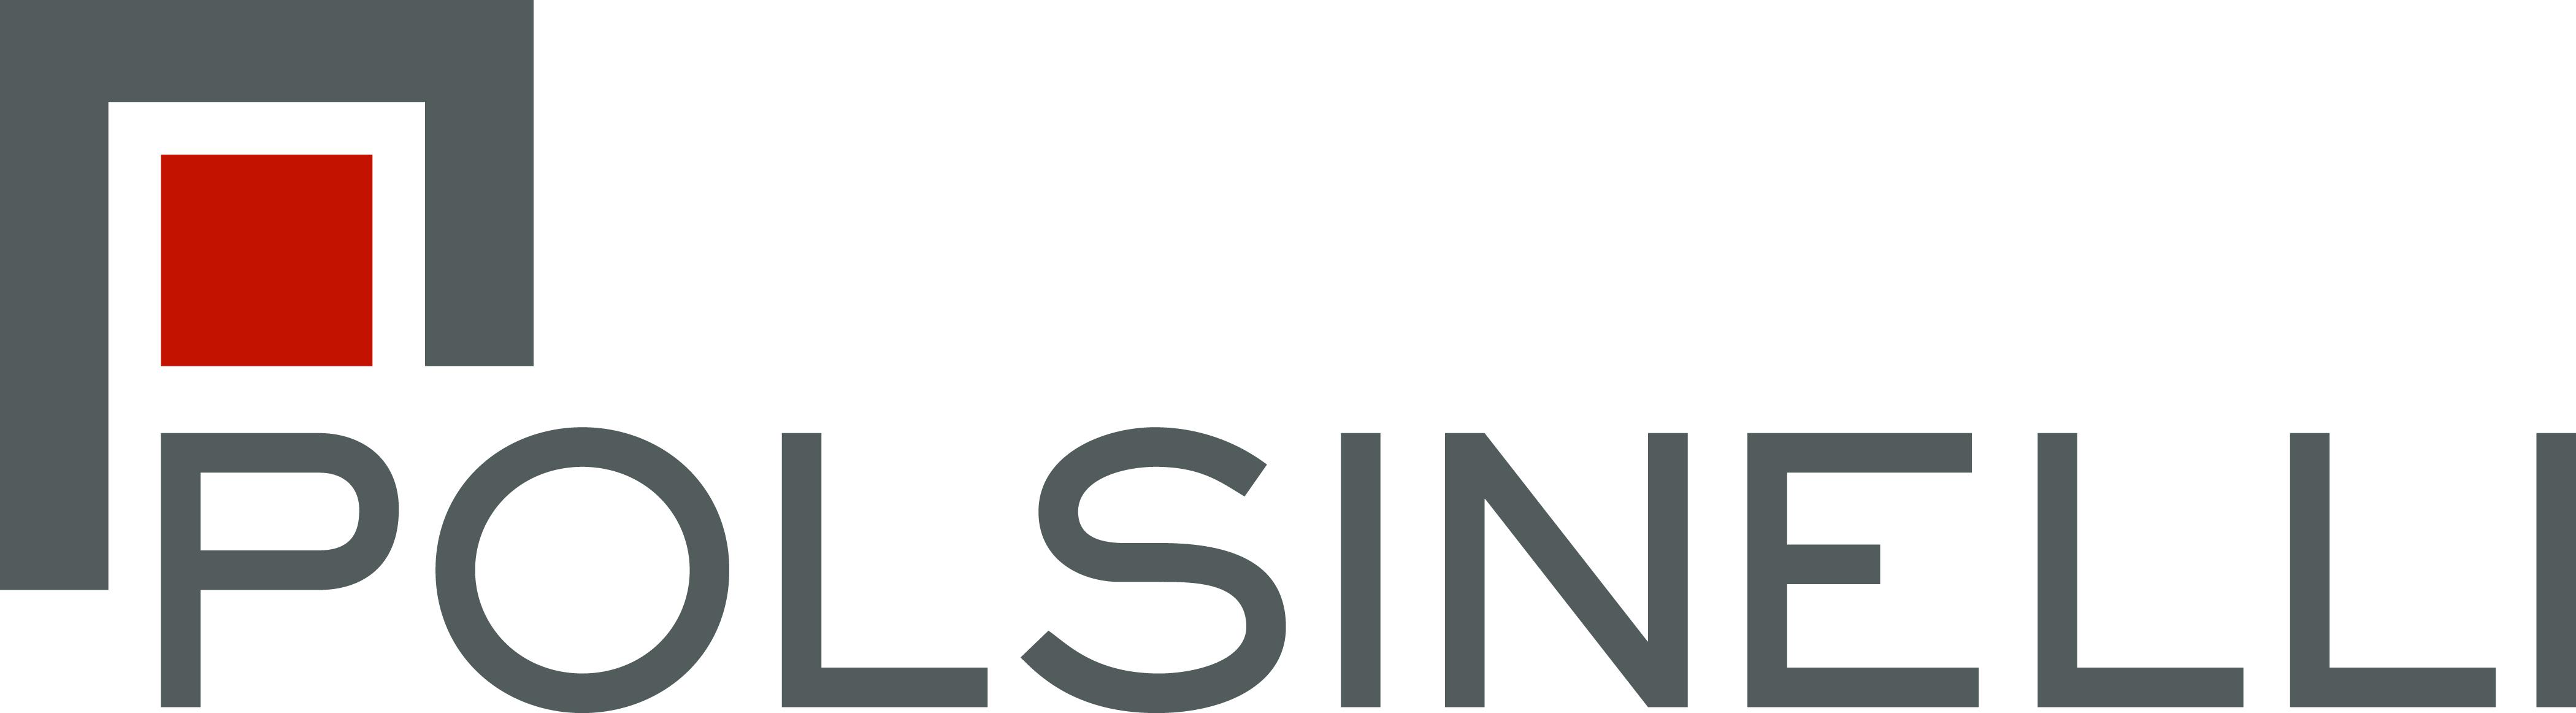 POLSINELLI-Logo_color.jpg